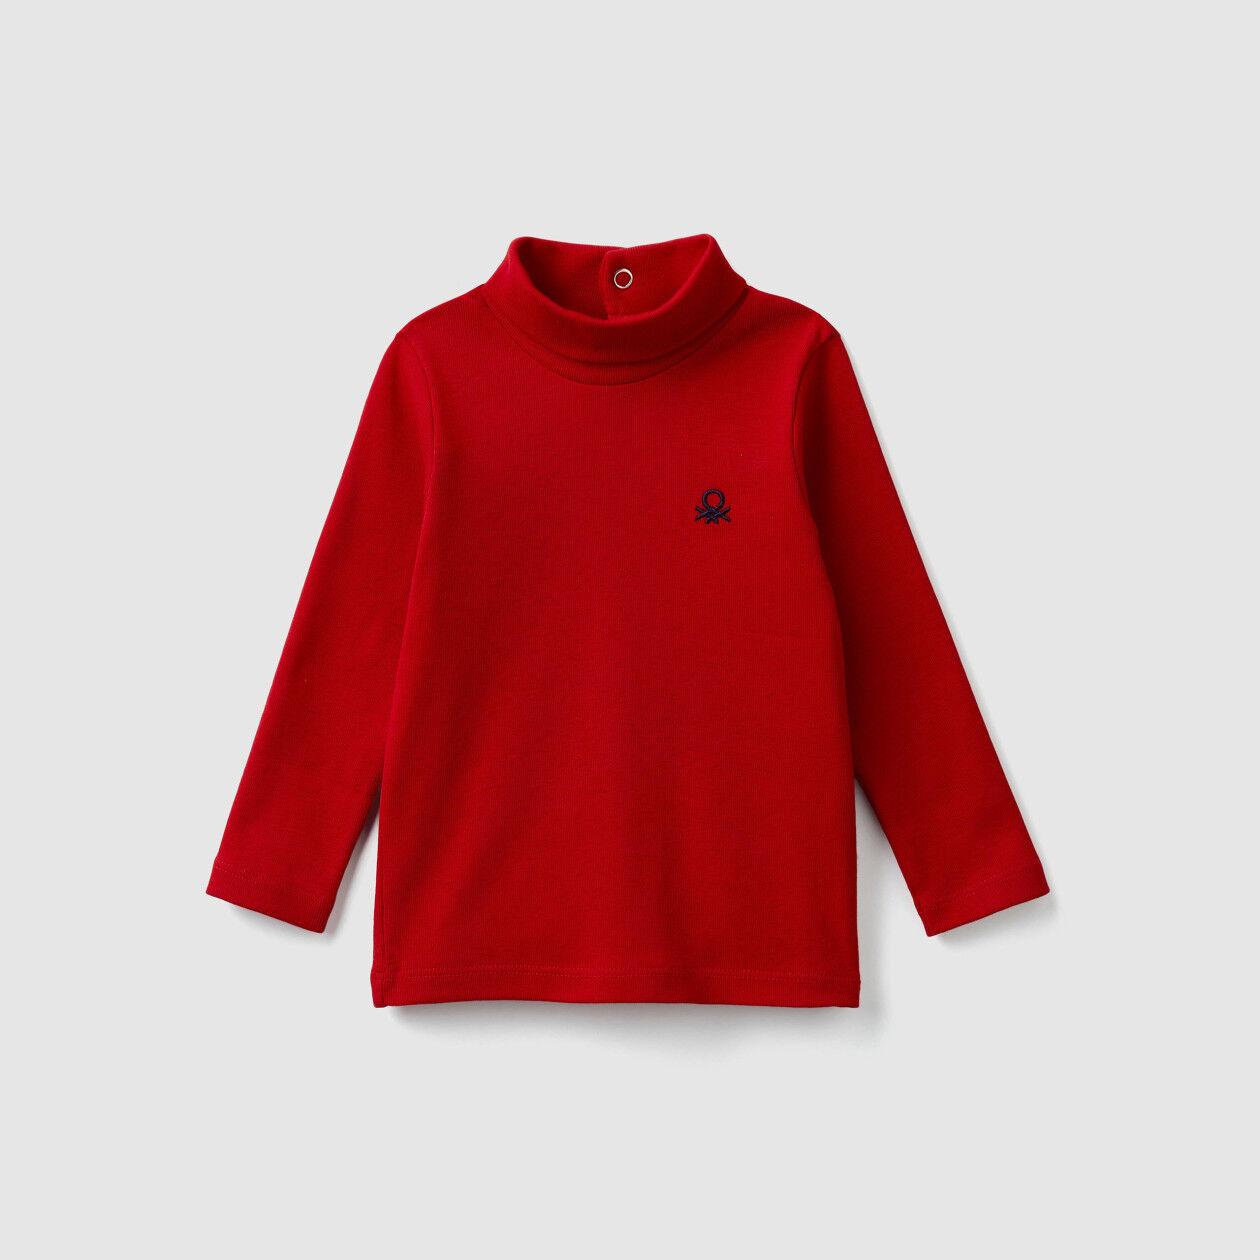 Turtleneck t-shirt in organic cotton